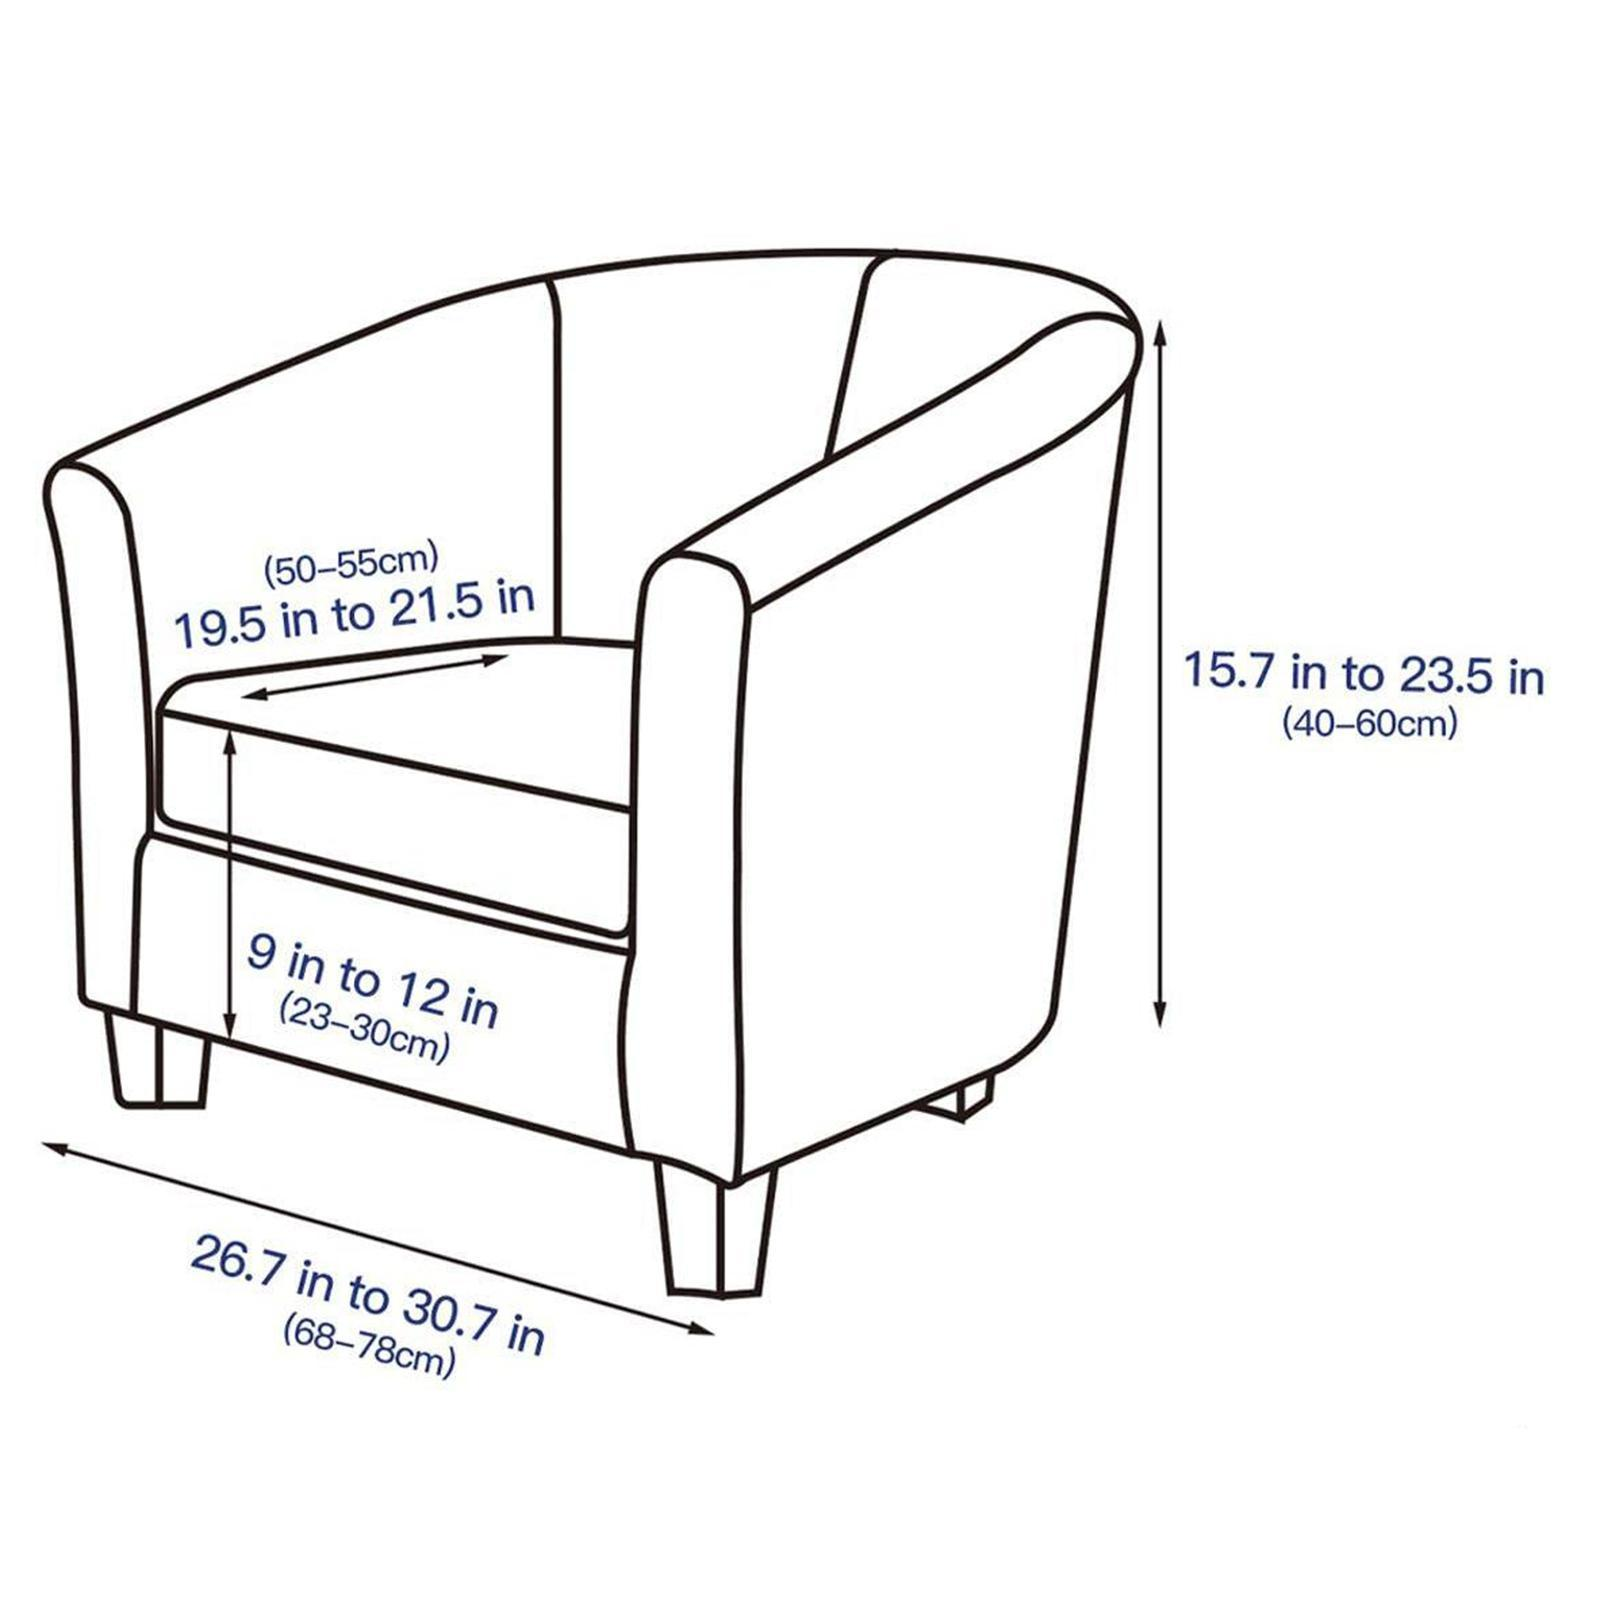 miniatura 7 - Fodera per poltrona singola per poltrona Fodera per sedia in colori assortiti